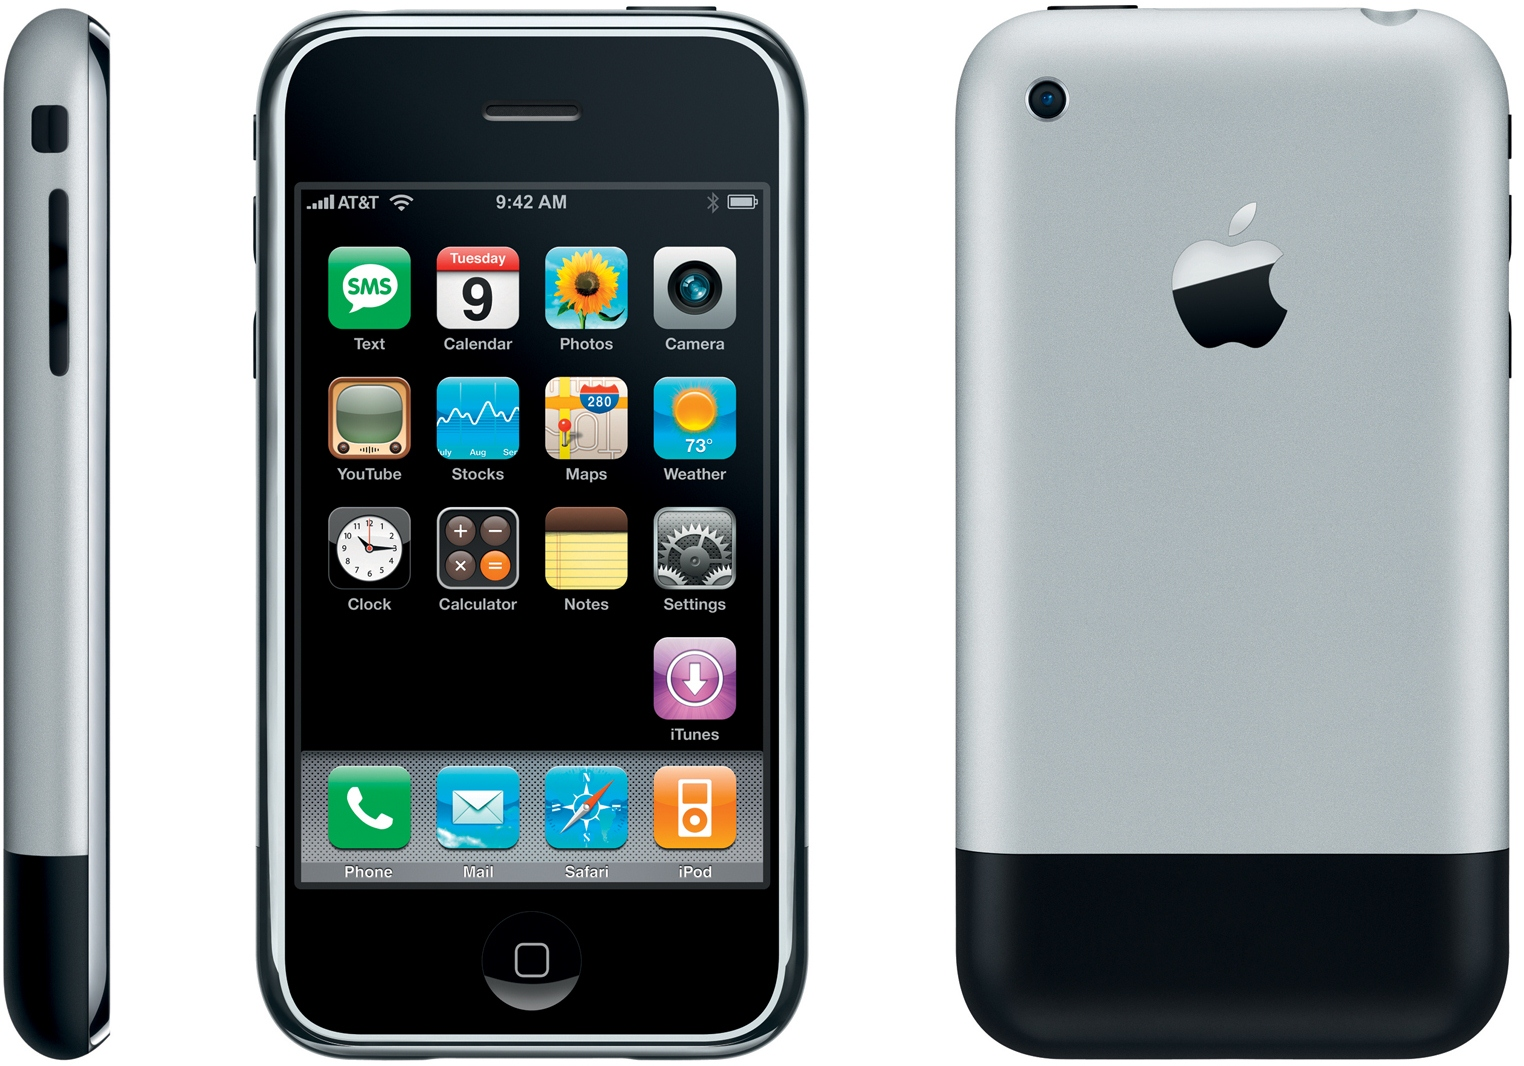 original-apple-iphone-2g-2007 steve jobs